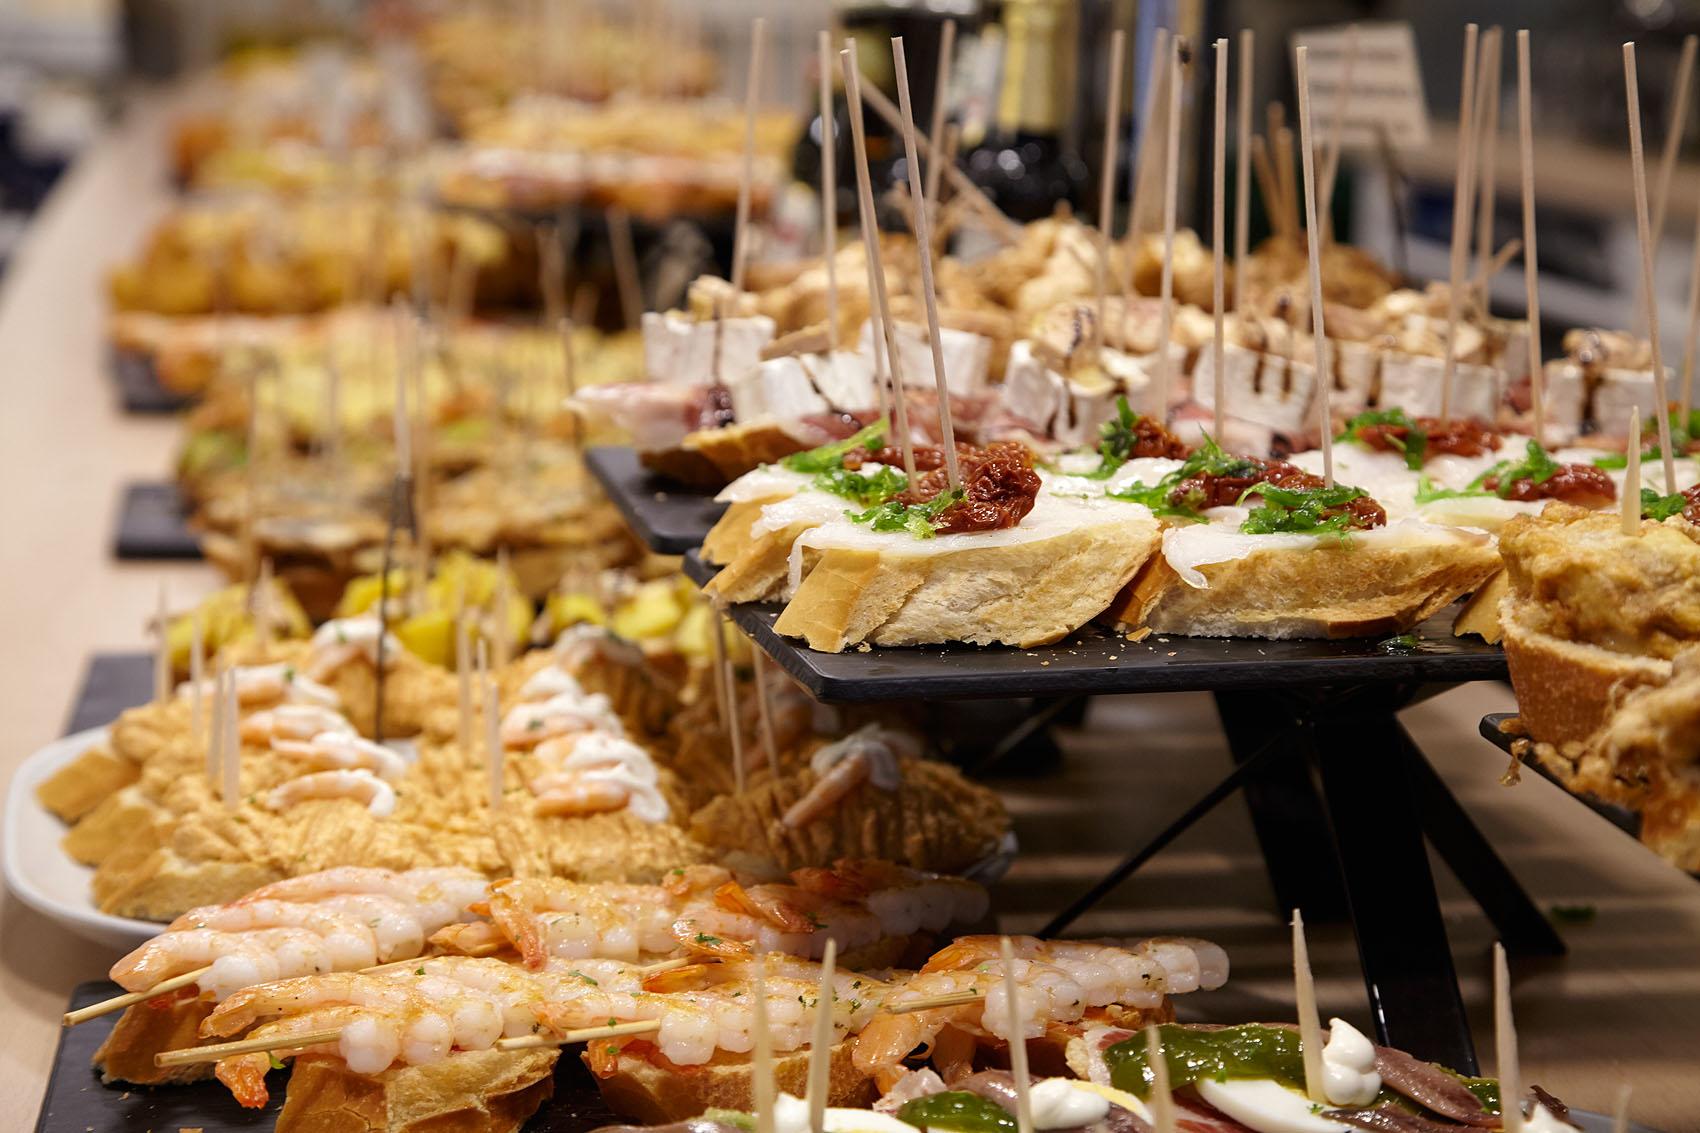 Restaurante Politena - Iñaki Caperochipi - Fotografía